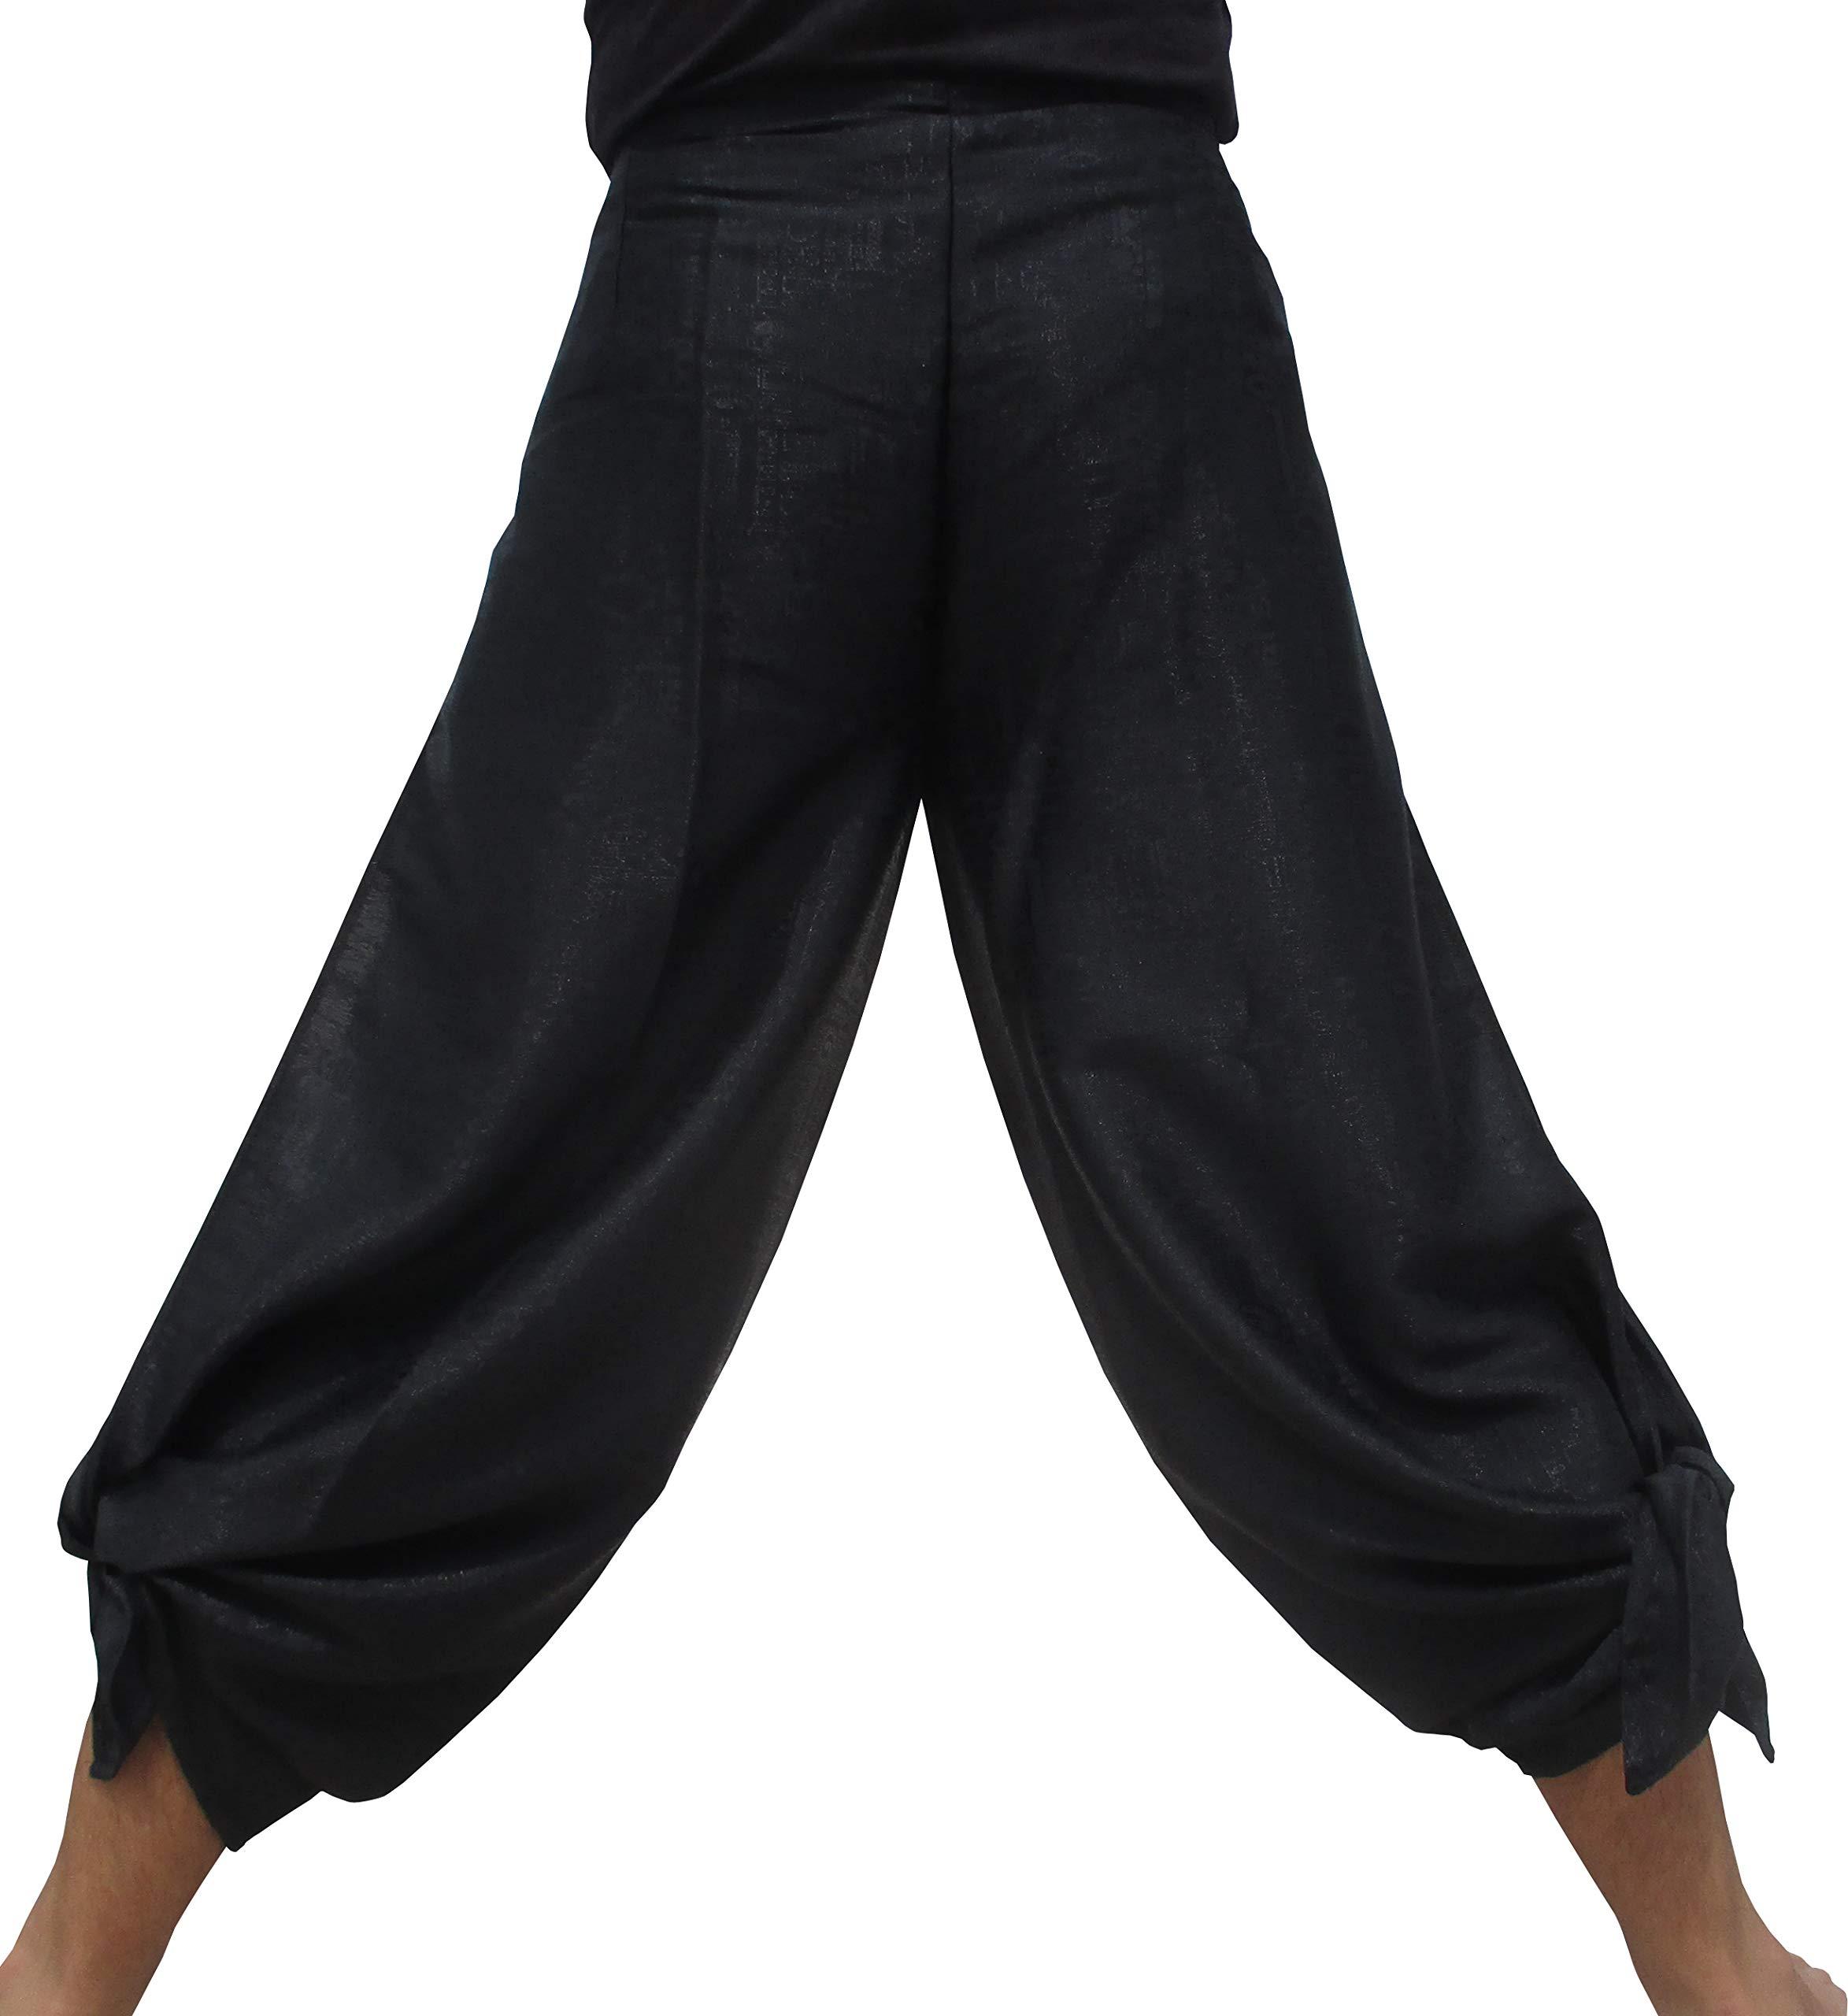 RaanPahMuang Brand Geometric Thick Textured Silk Drive in Wrap Pants, Medium, Black by RaanPahMuang